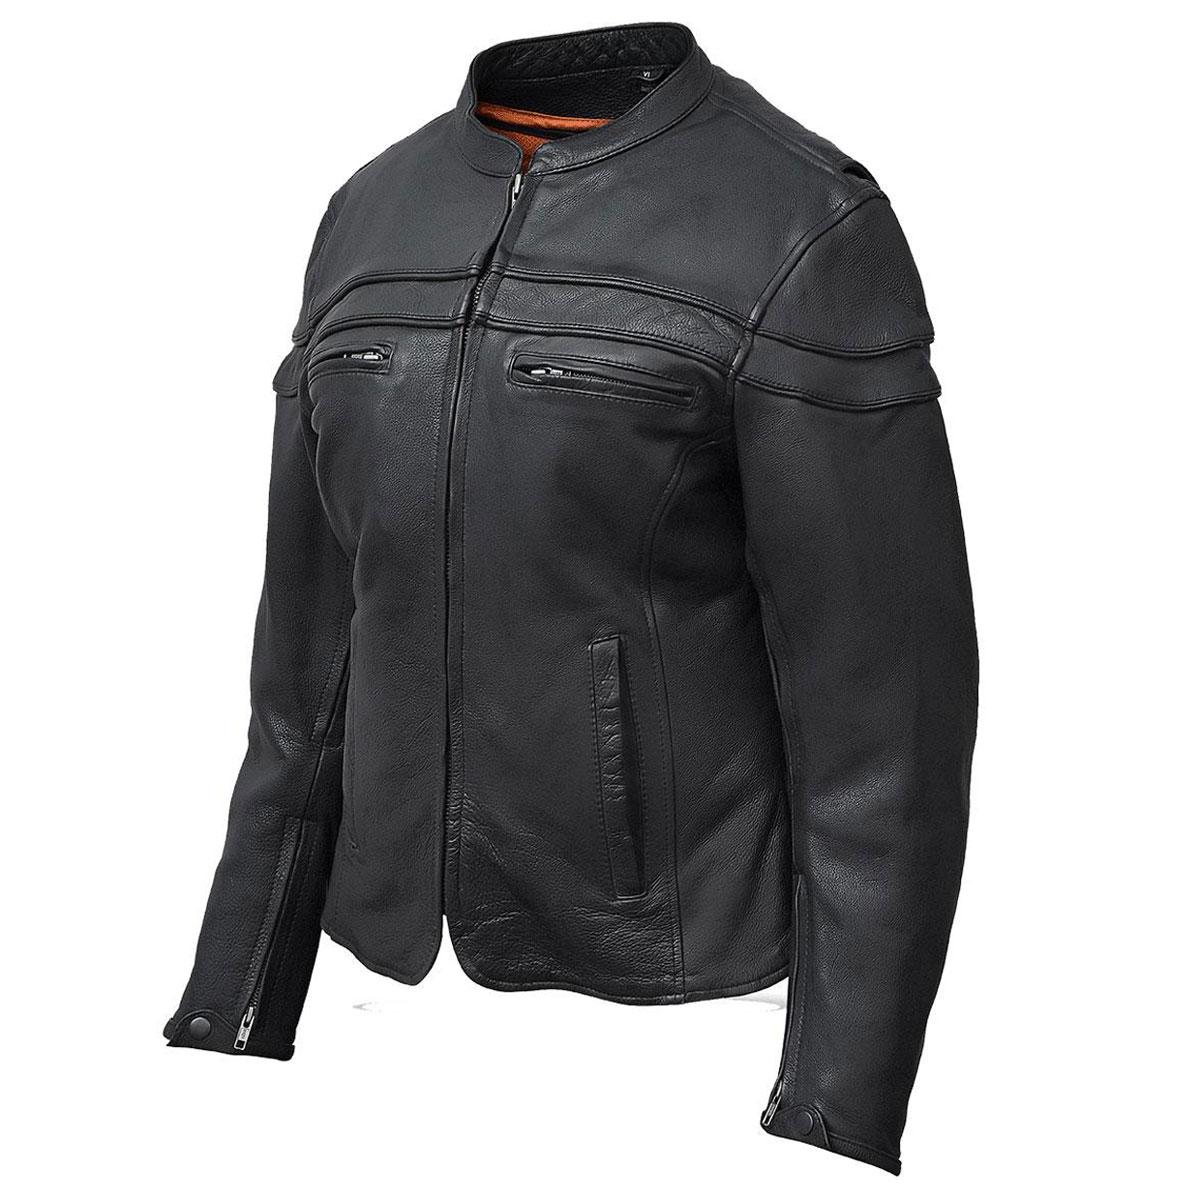 Vance Leathers Women's Racer Black Leather Jacket